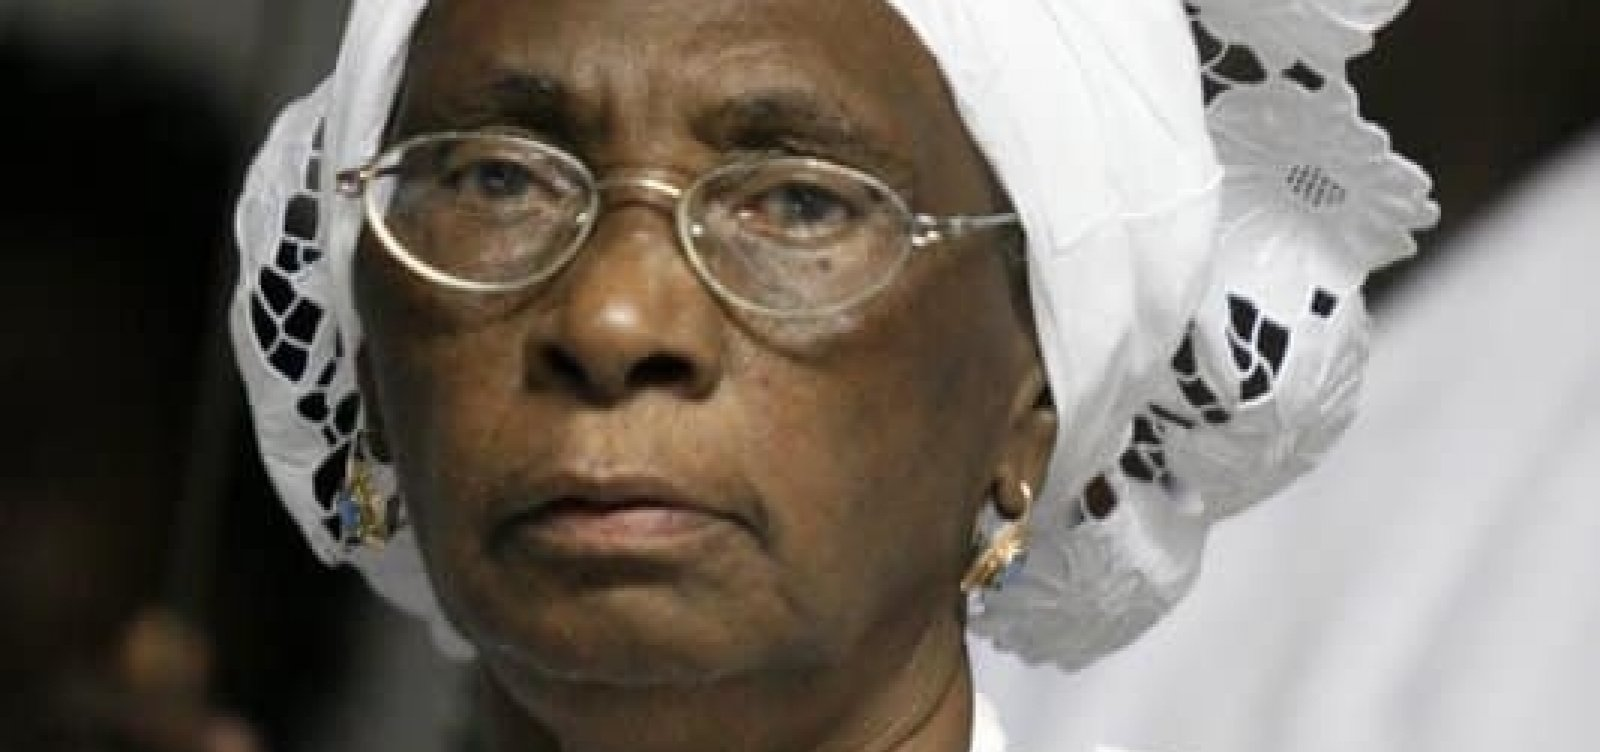 Ialorixá mais velha no candomblé Banto Angola, Mãe Xagui morre aos 92 anos